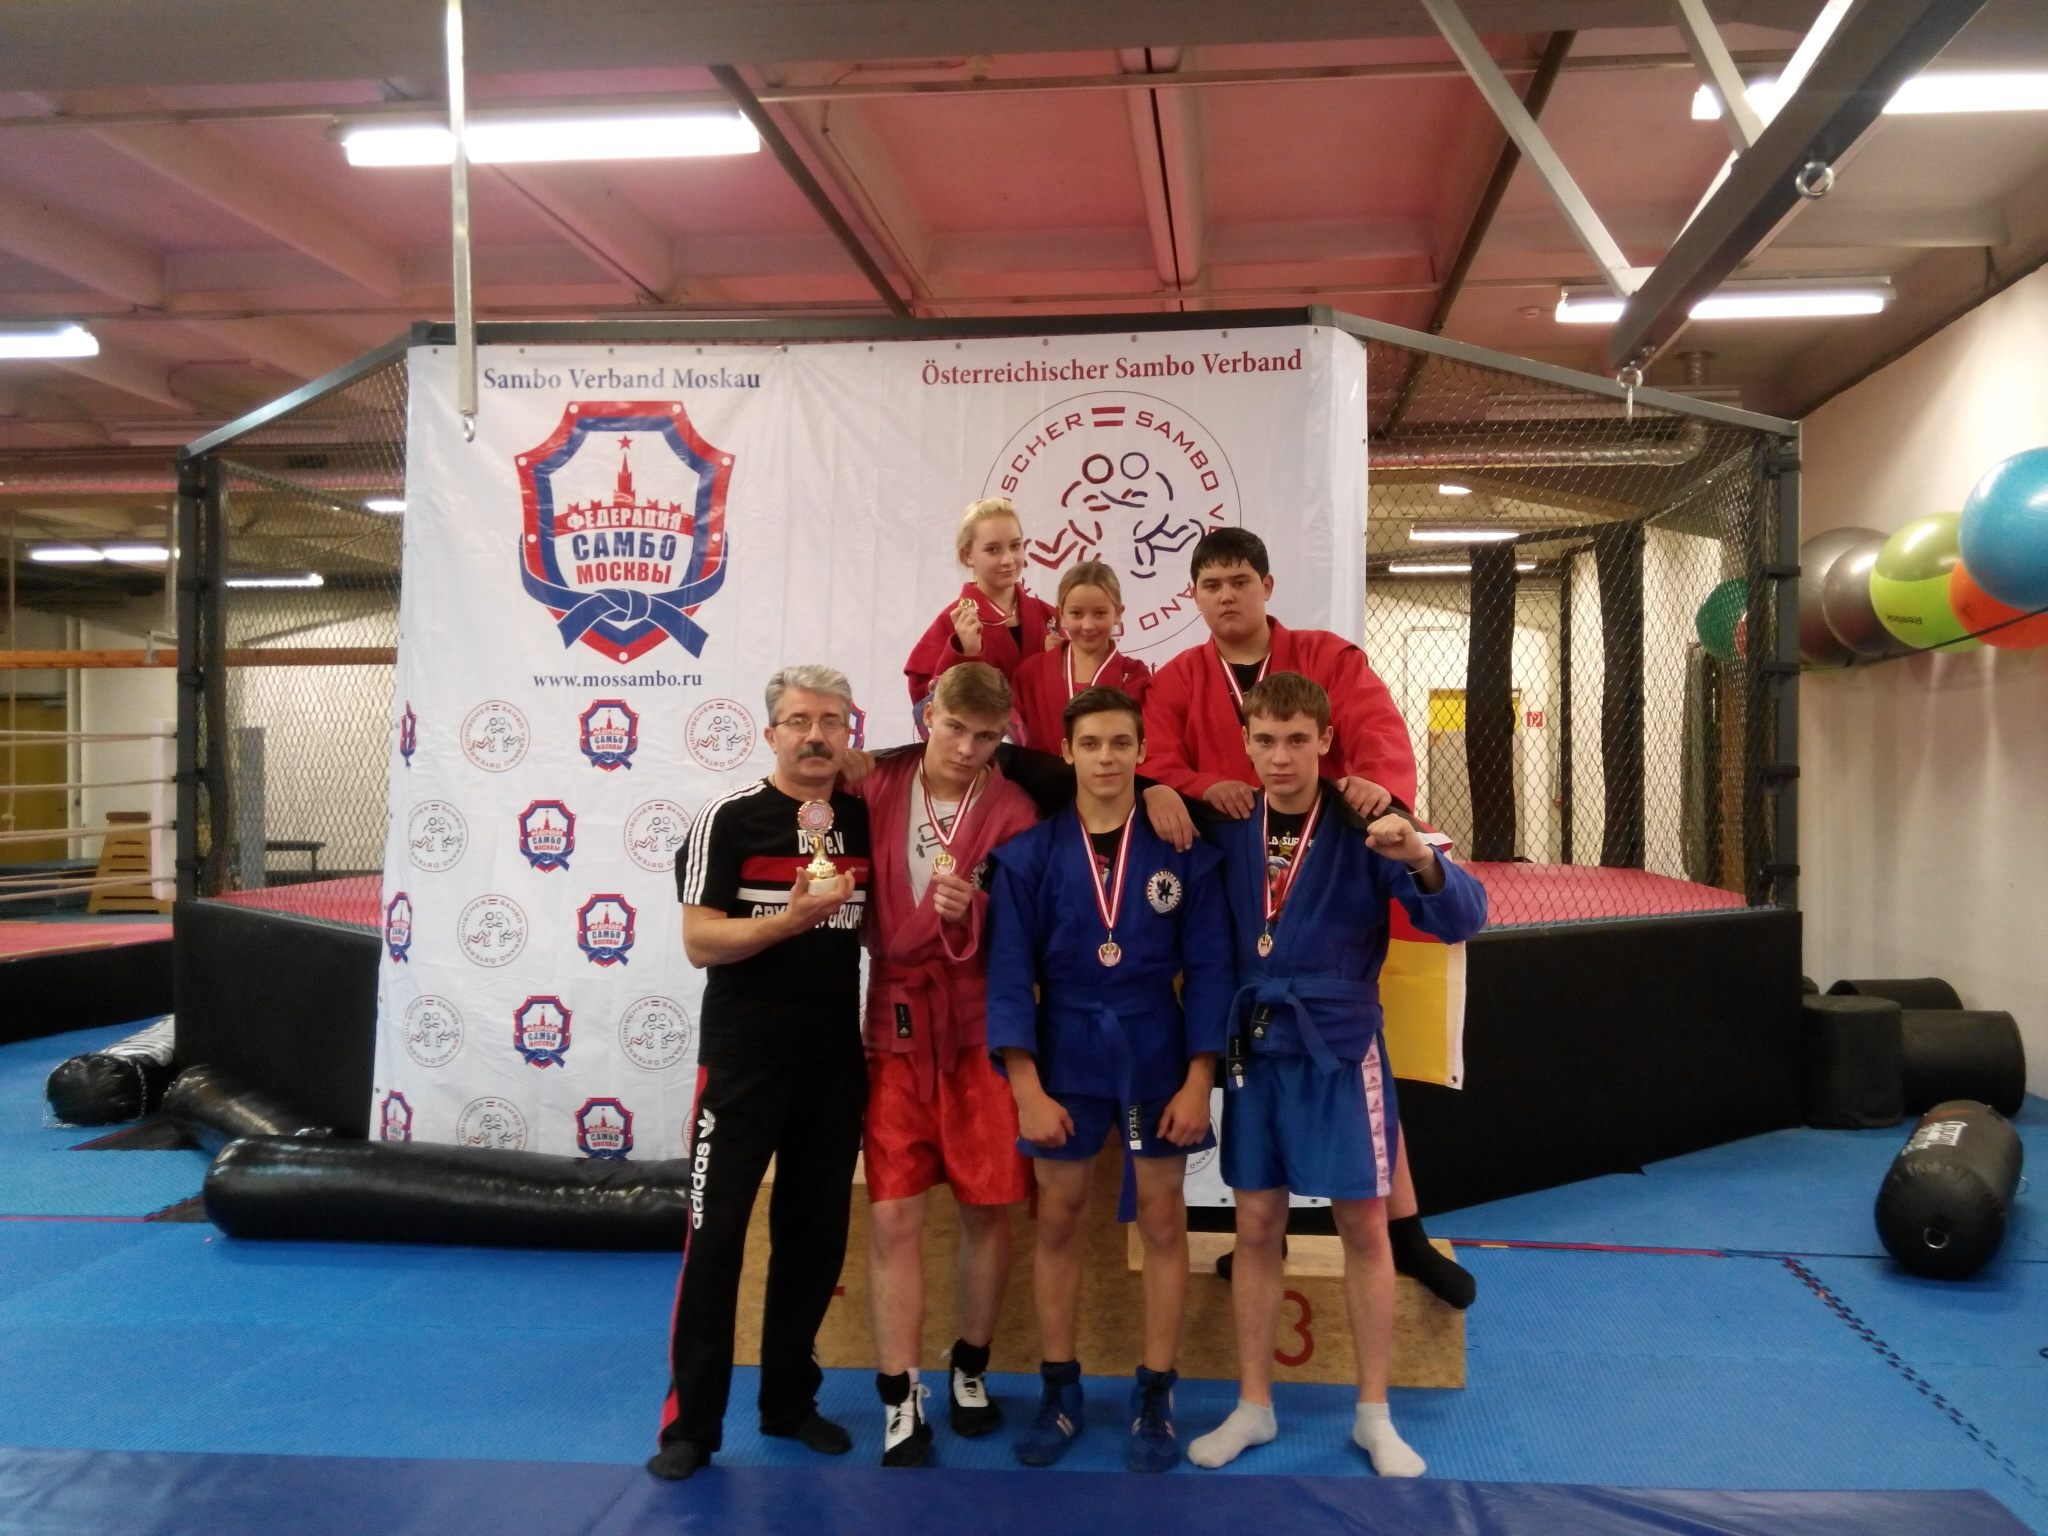 Sieger-Gruppe Gryphon -Berlin. 5 golden und 1 silber Medallien-